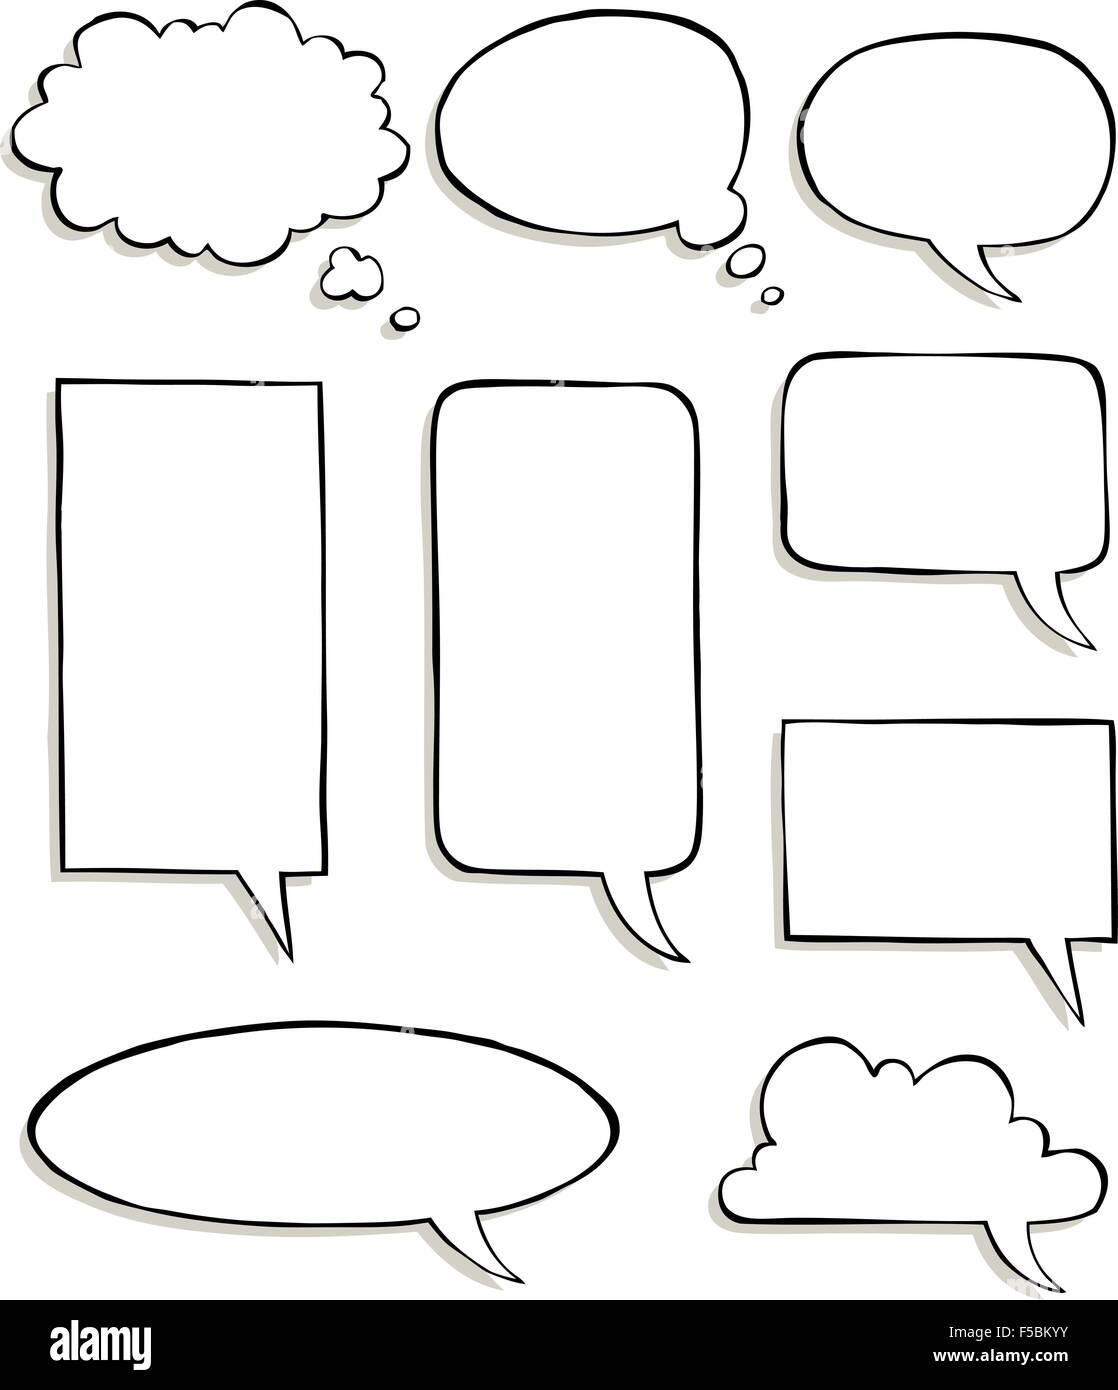 Set of comic speech bubbles vector illustration - Stock Vector